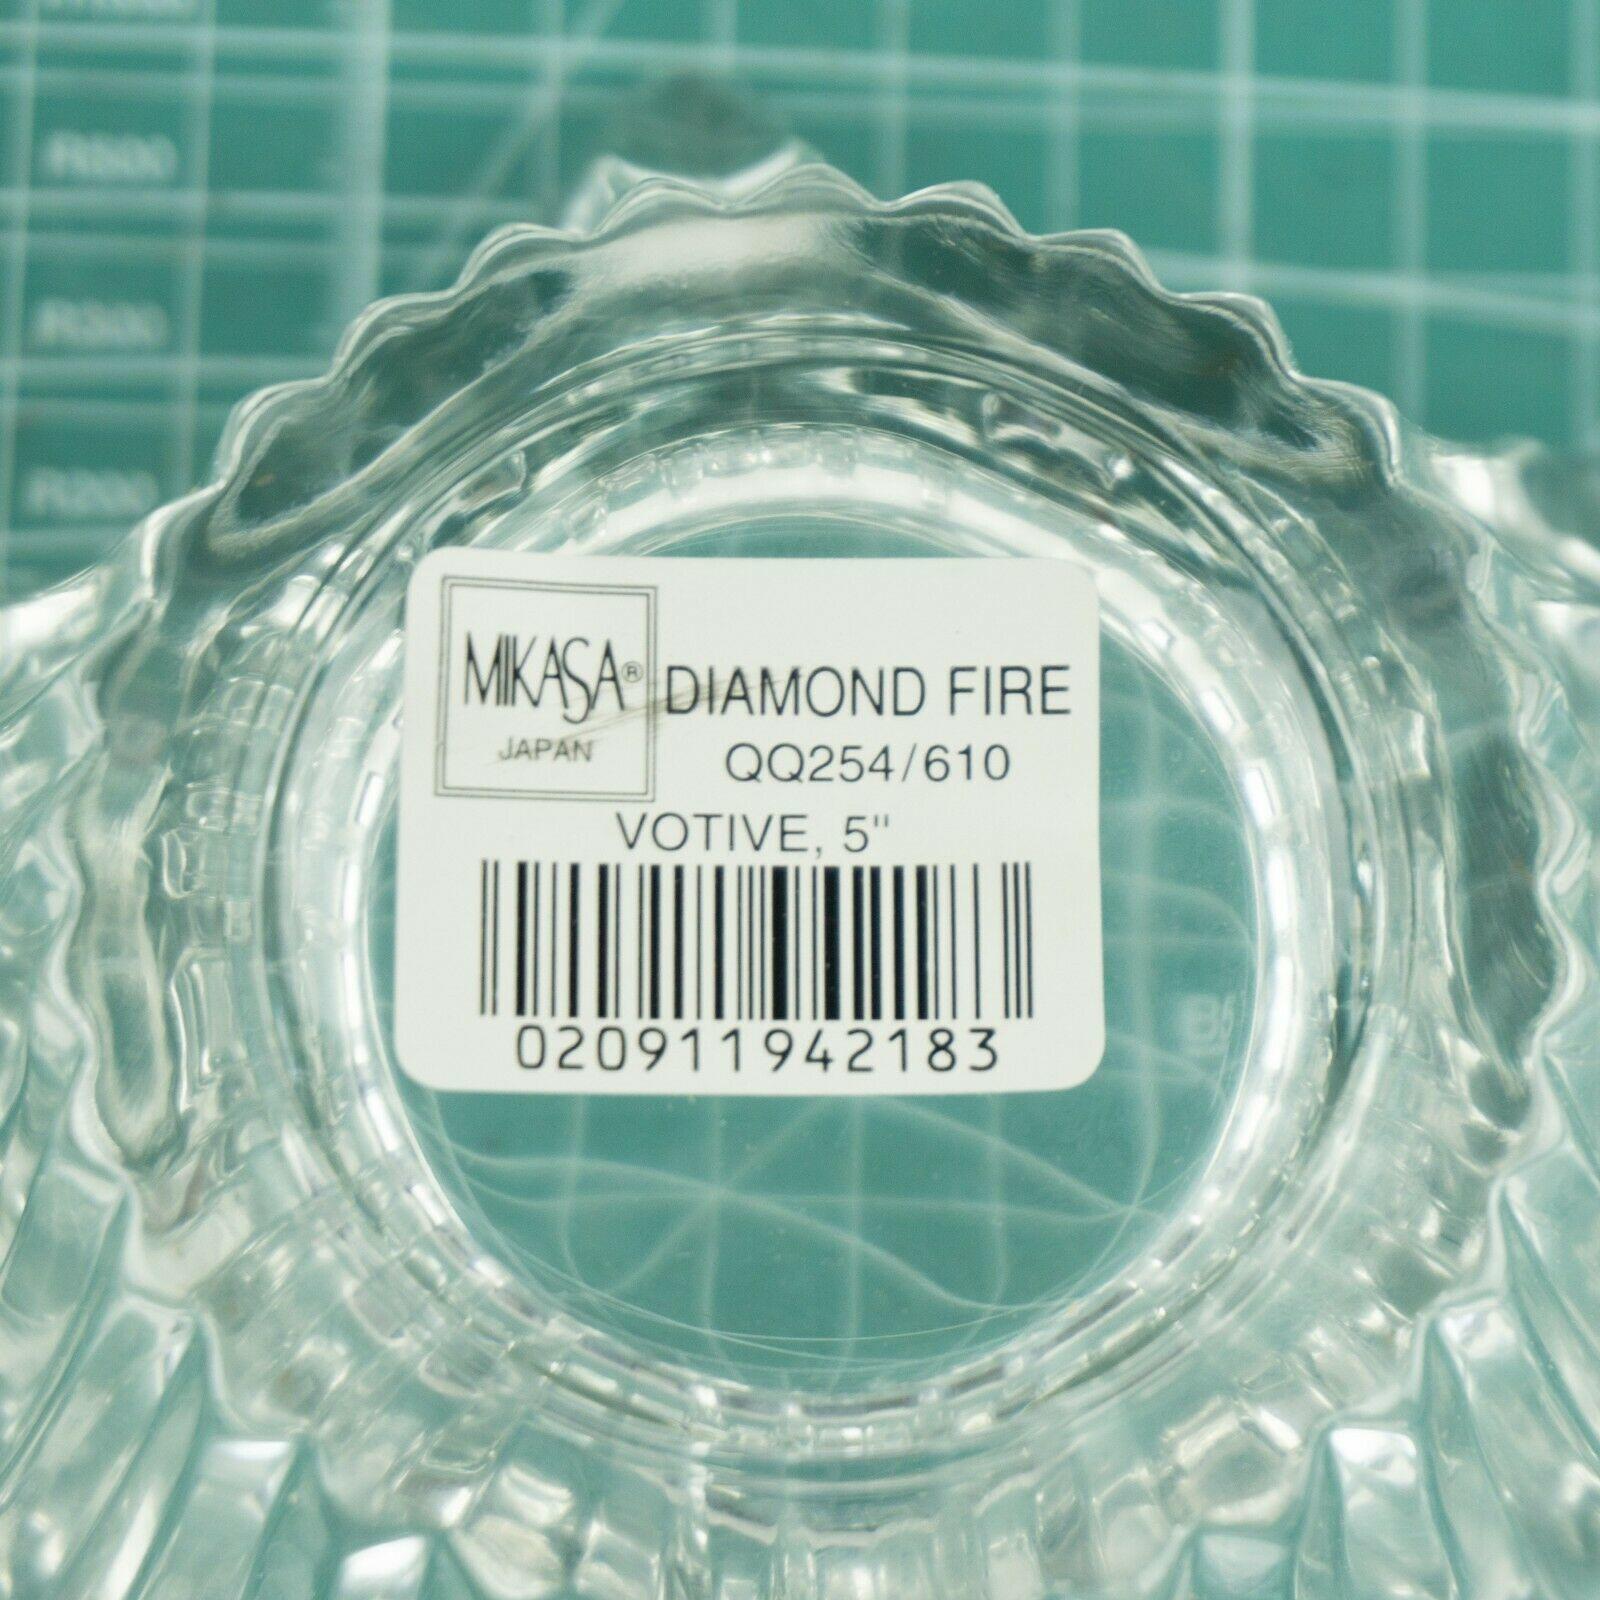 "VTG Mikasa Japan Votive 5"" Six Sided Tealight Candle Holder Key Glass Decorative image 4"